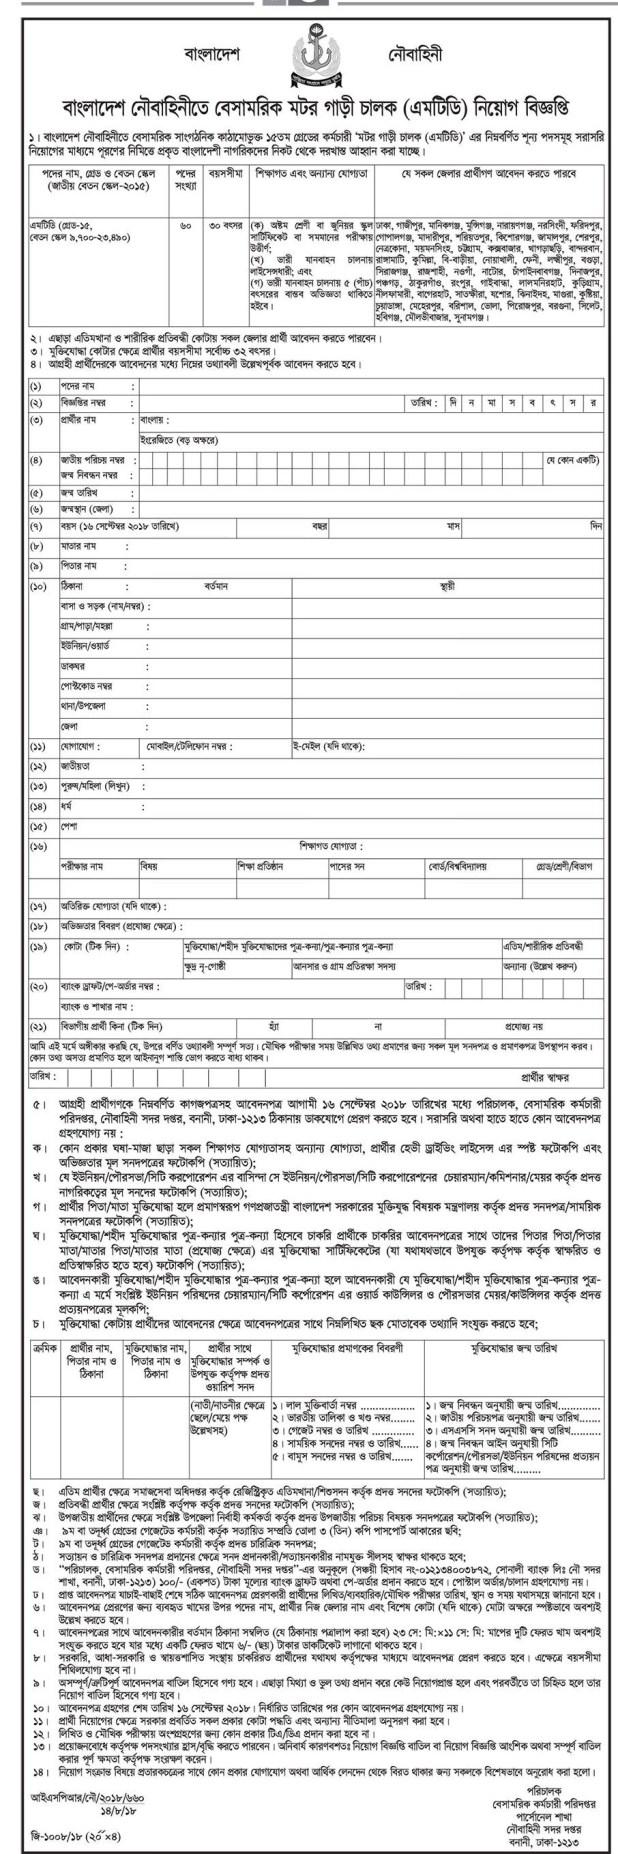 Bangladesh Navy Civilian Job Circular 2018